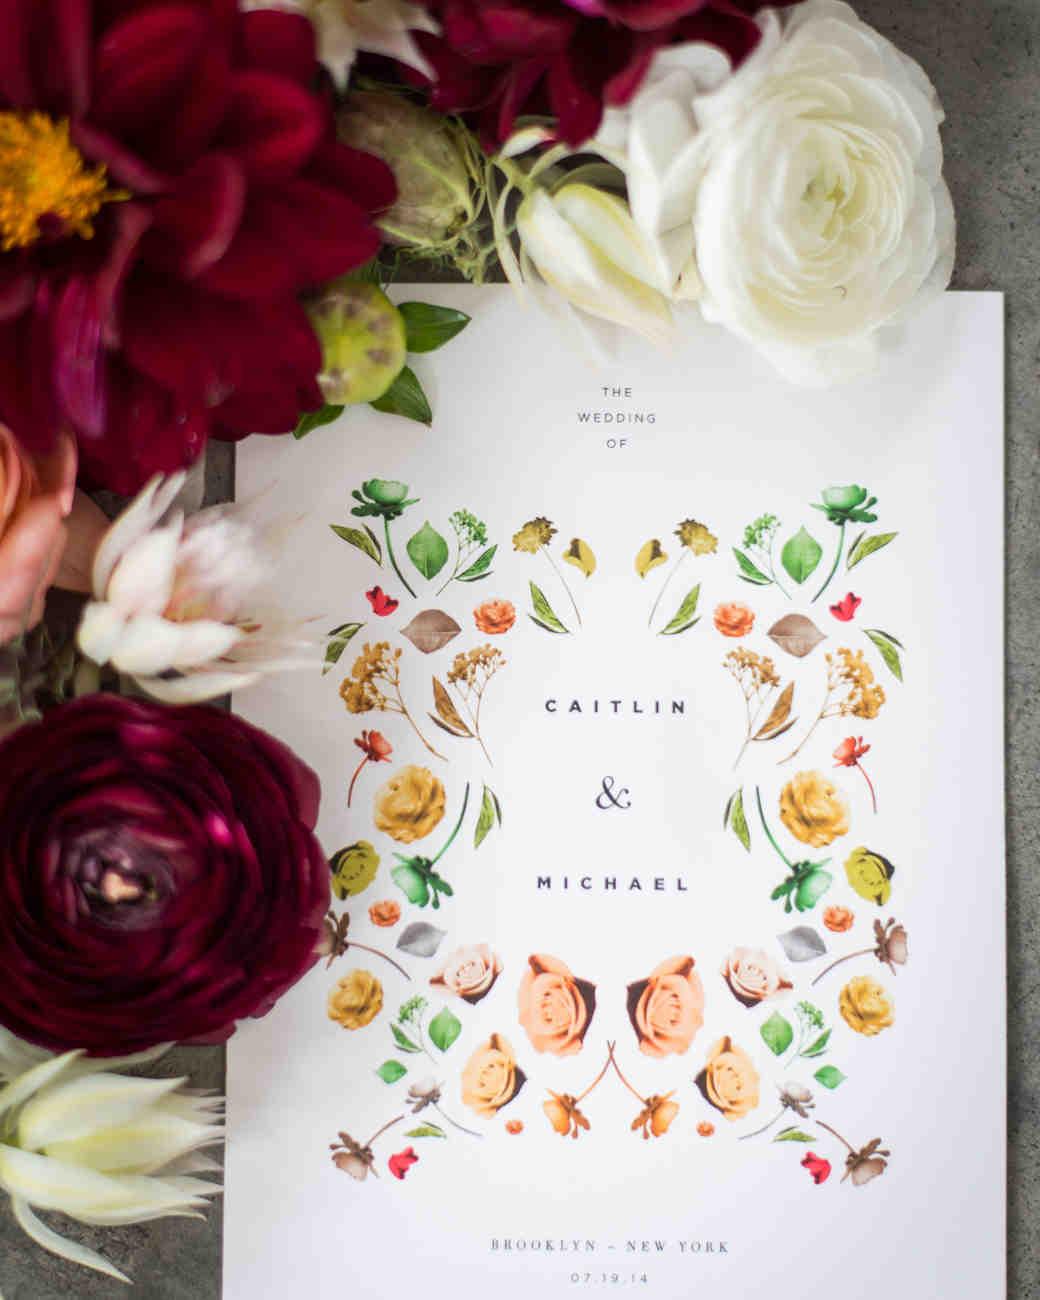 wedding invitations kit michaels michaels wedding invites Wedding Invitations Kit Michaels the invites